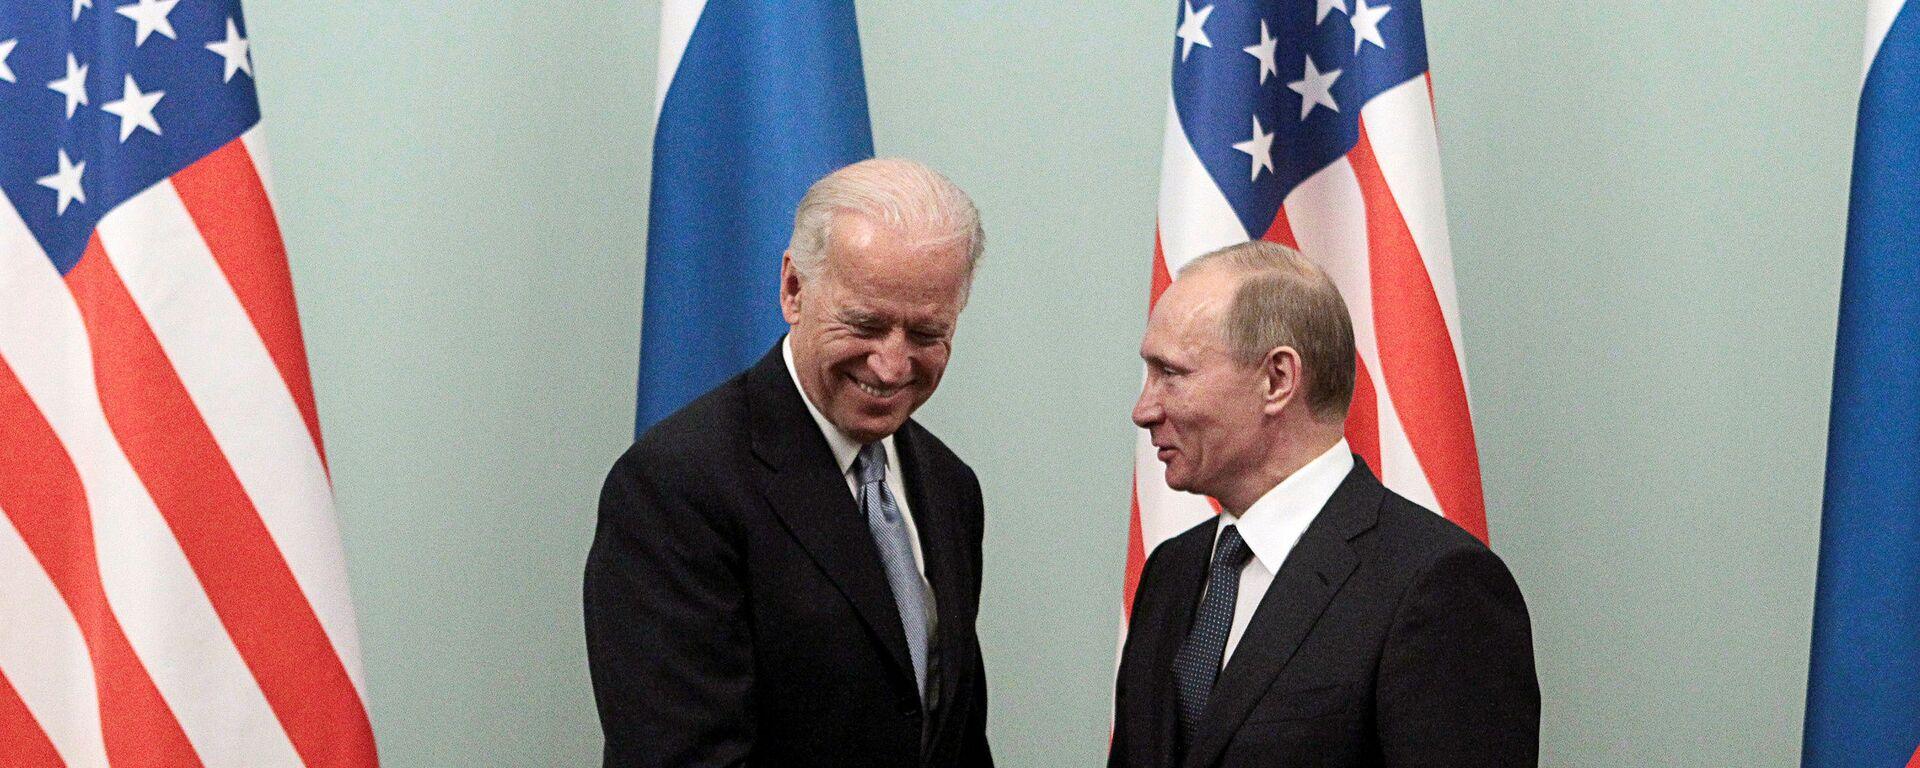 Vladímir Putin y Joe Biden (archivo, 2011) - Sputnik Mundo, 1920, 26.05.2021